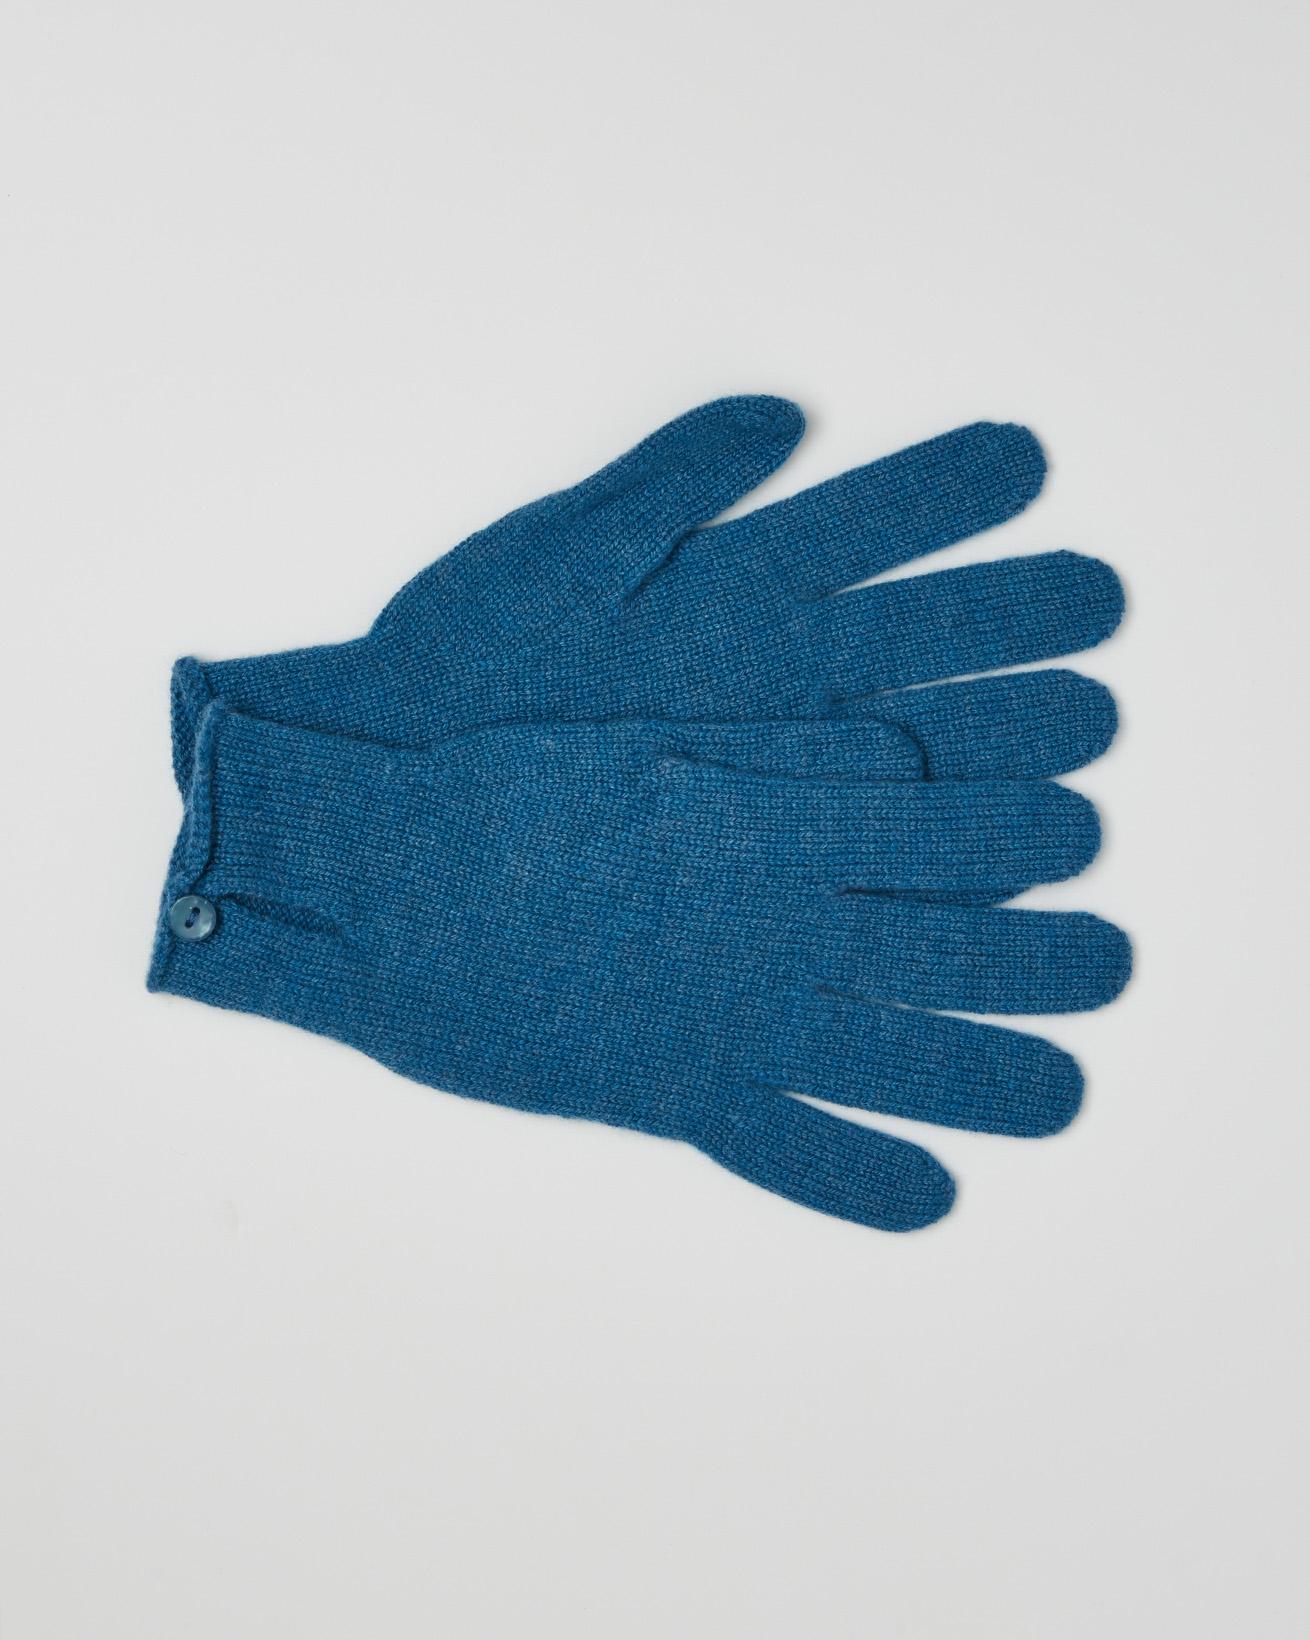 Cashmere Button Gloves - Cobalt Blue - One Size - 2627